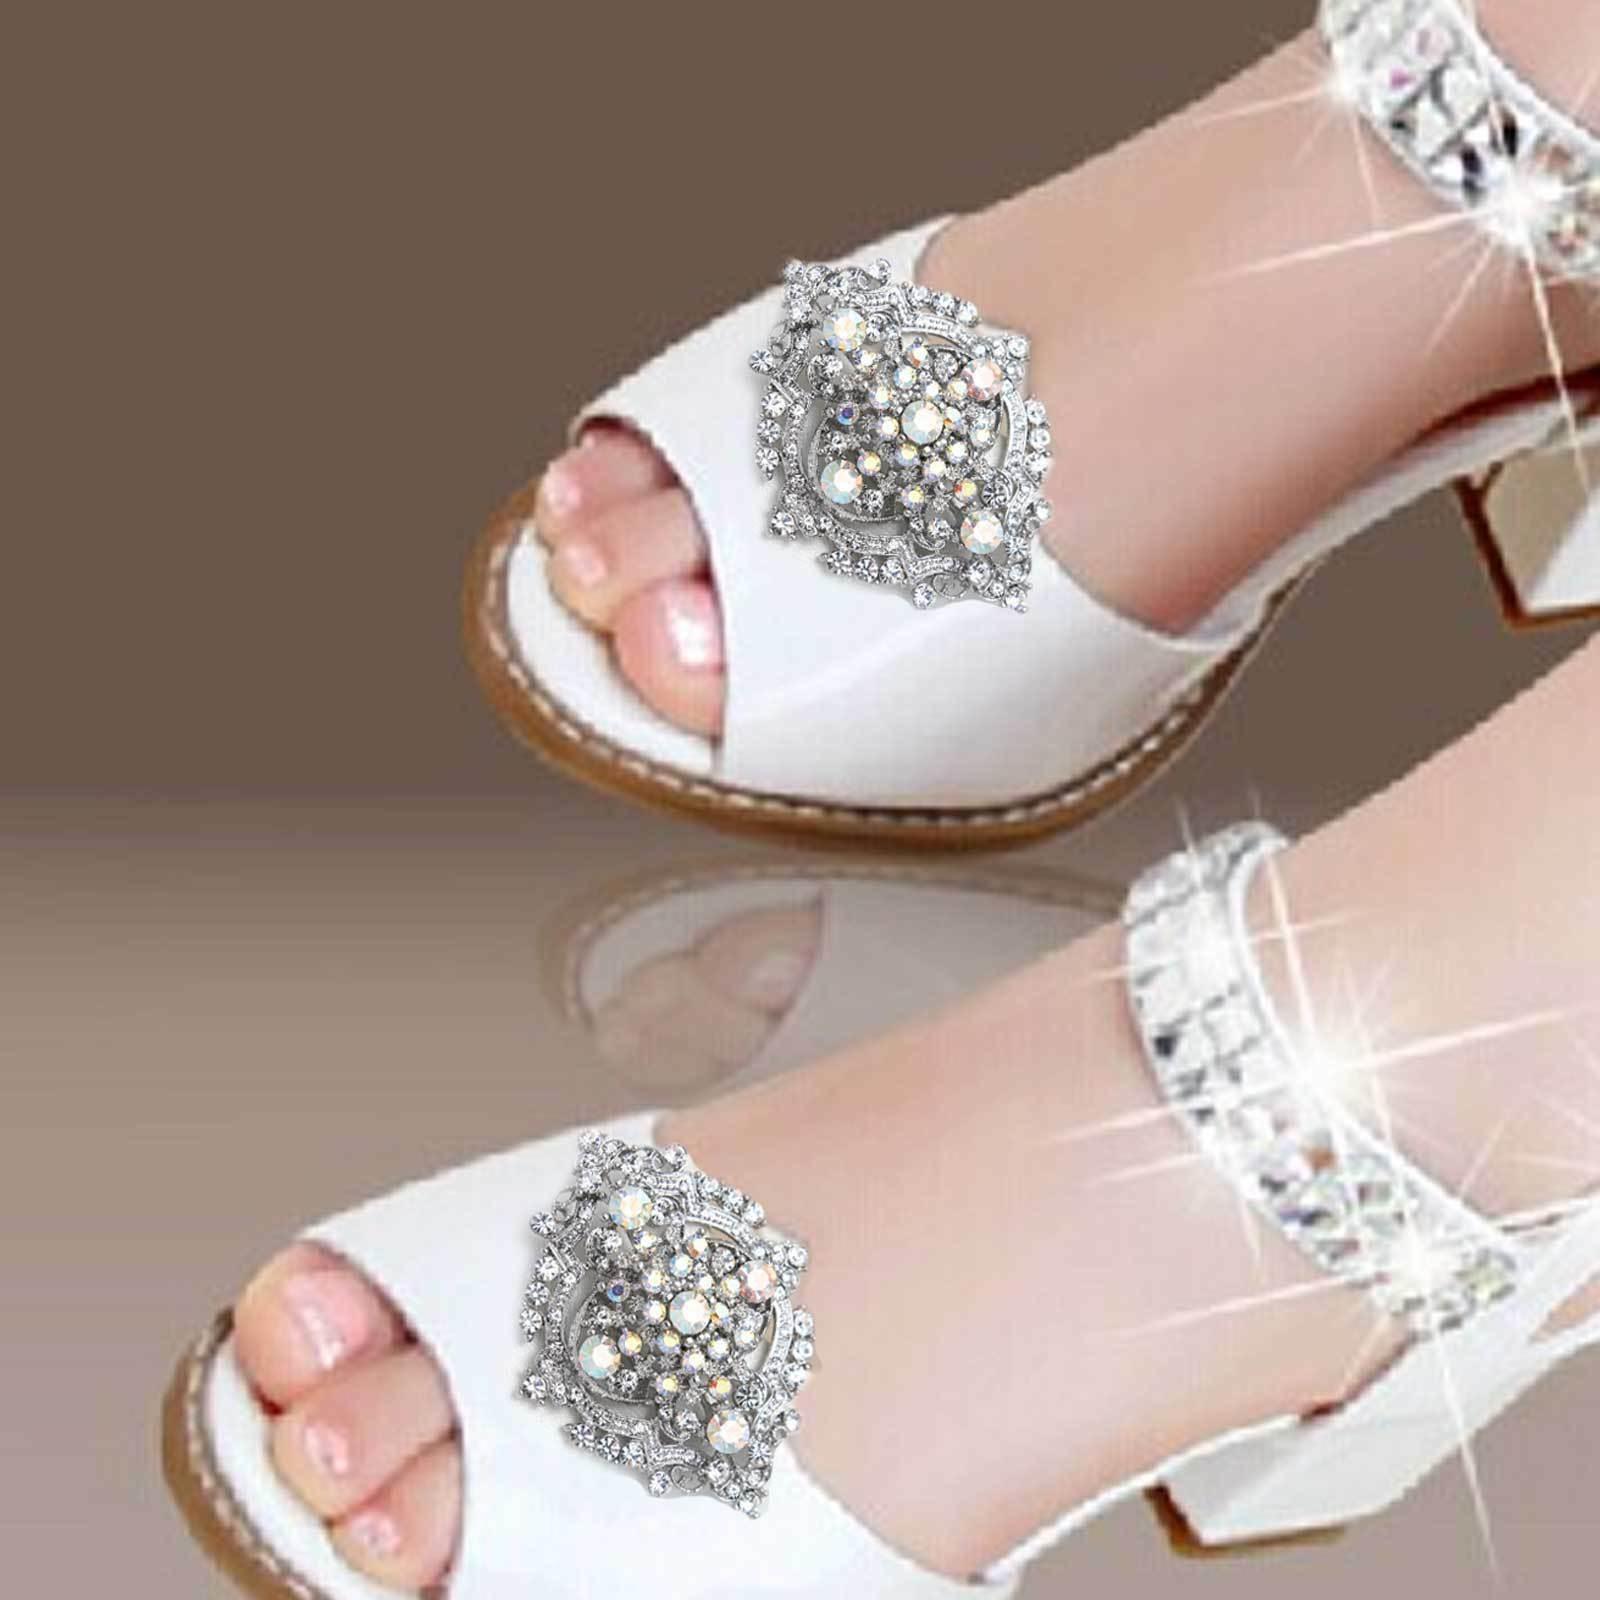 2 Pcs Vintage Aurora Rainbow Crystal Wedding Shoe Clips Bridal Shoes Decoration